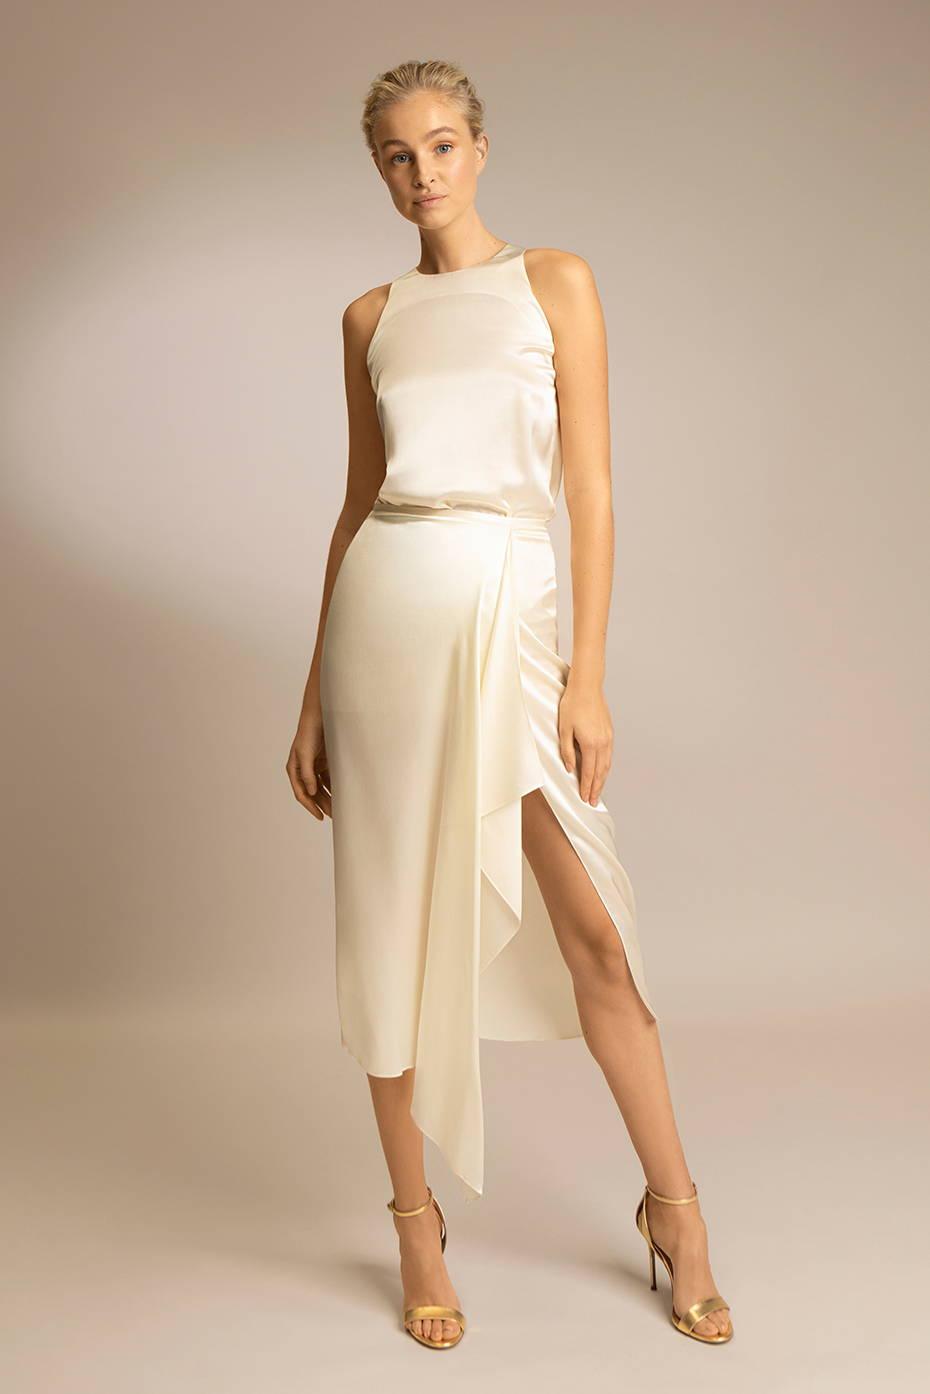 Women's Satin Dress and Top | PENDA Women